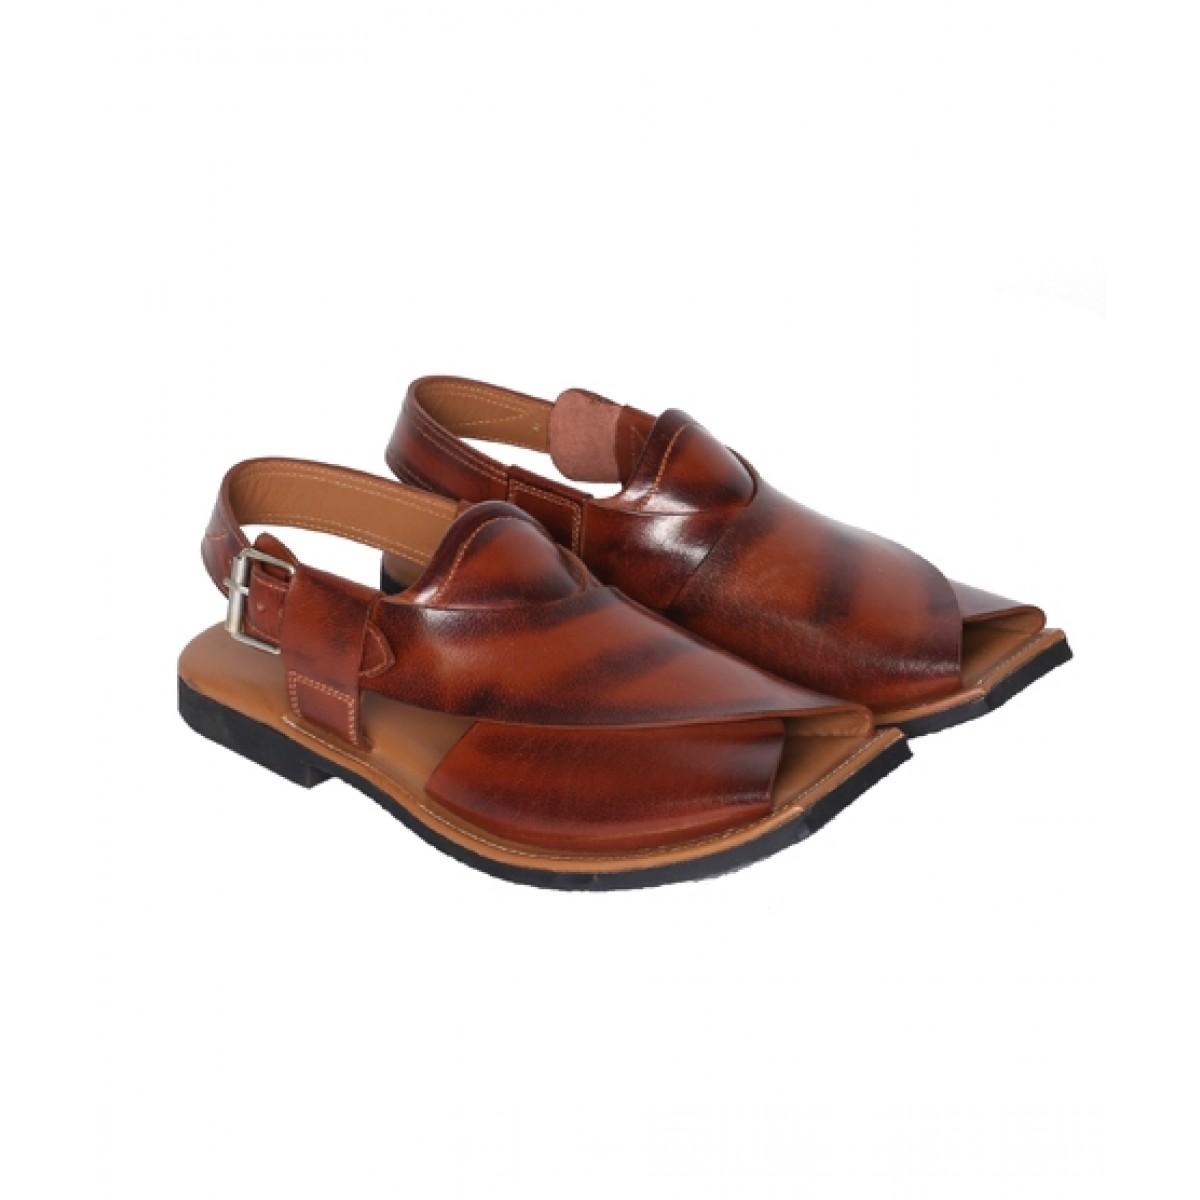 NOVADO Ajab Khan Leather Peshawari Sandal For Men Cognac (0048)